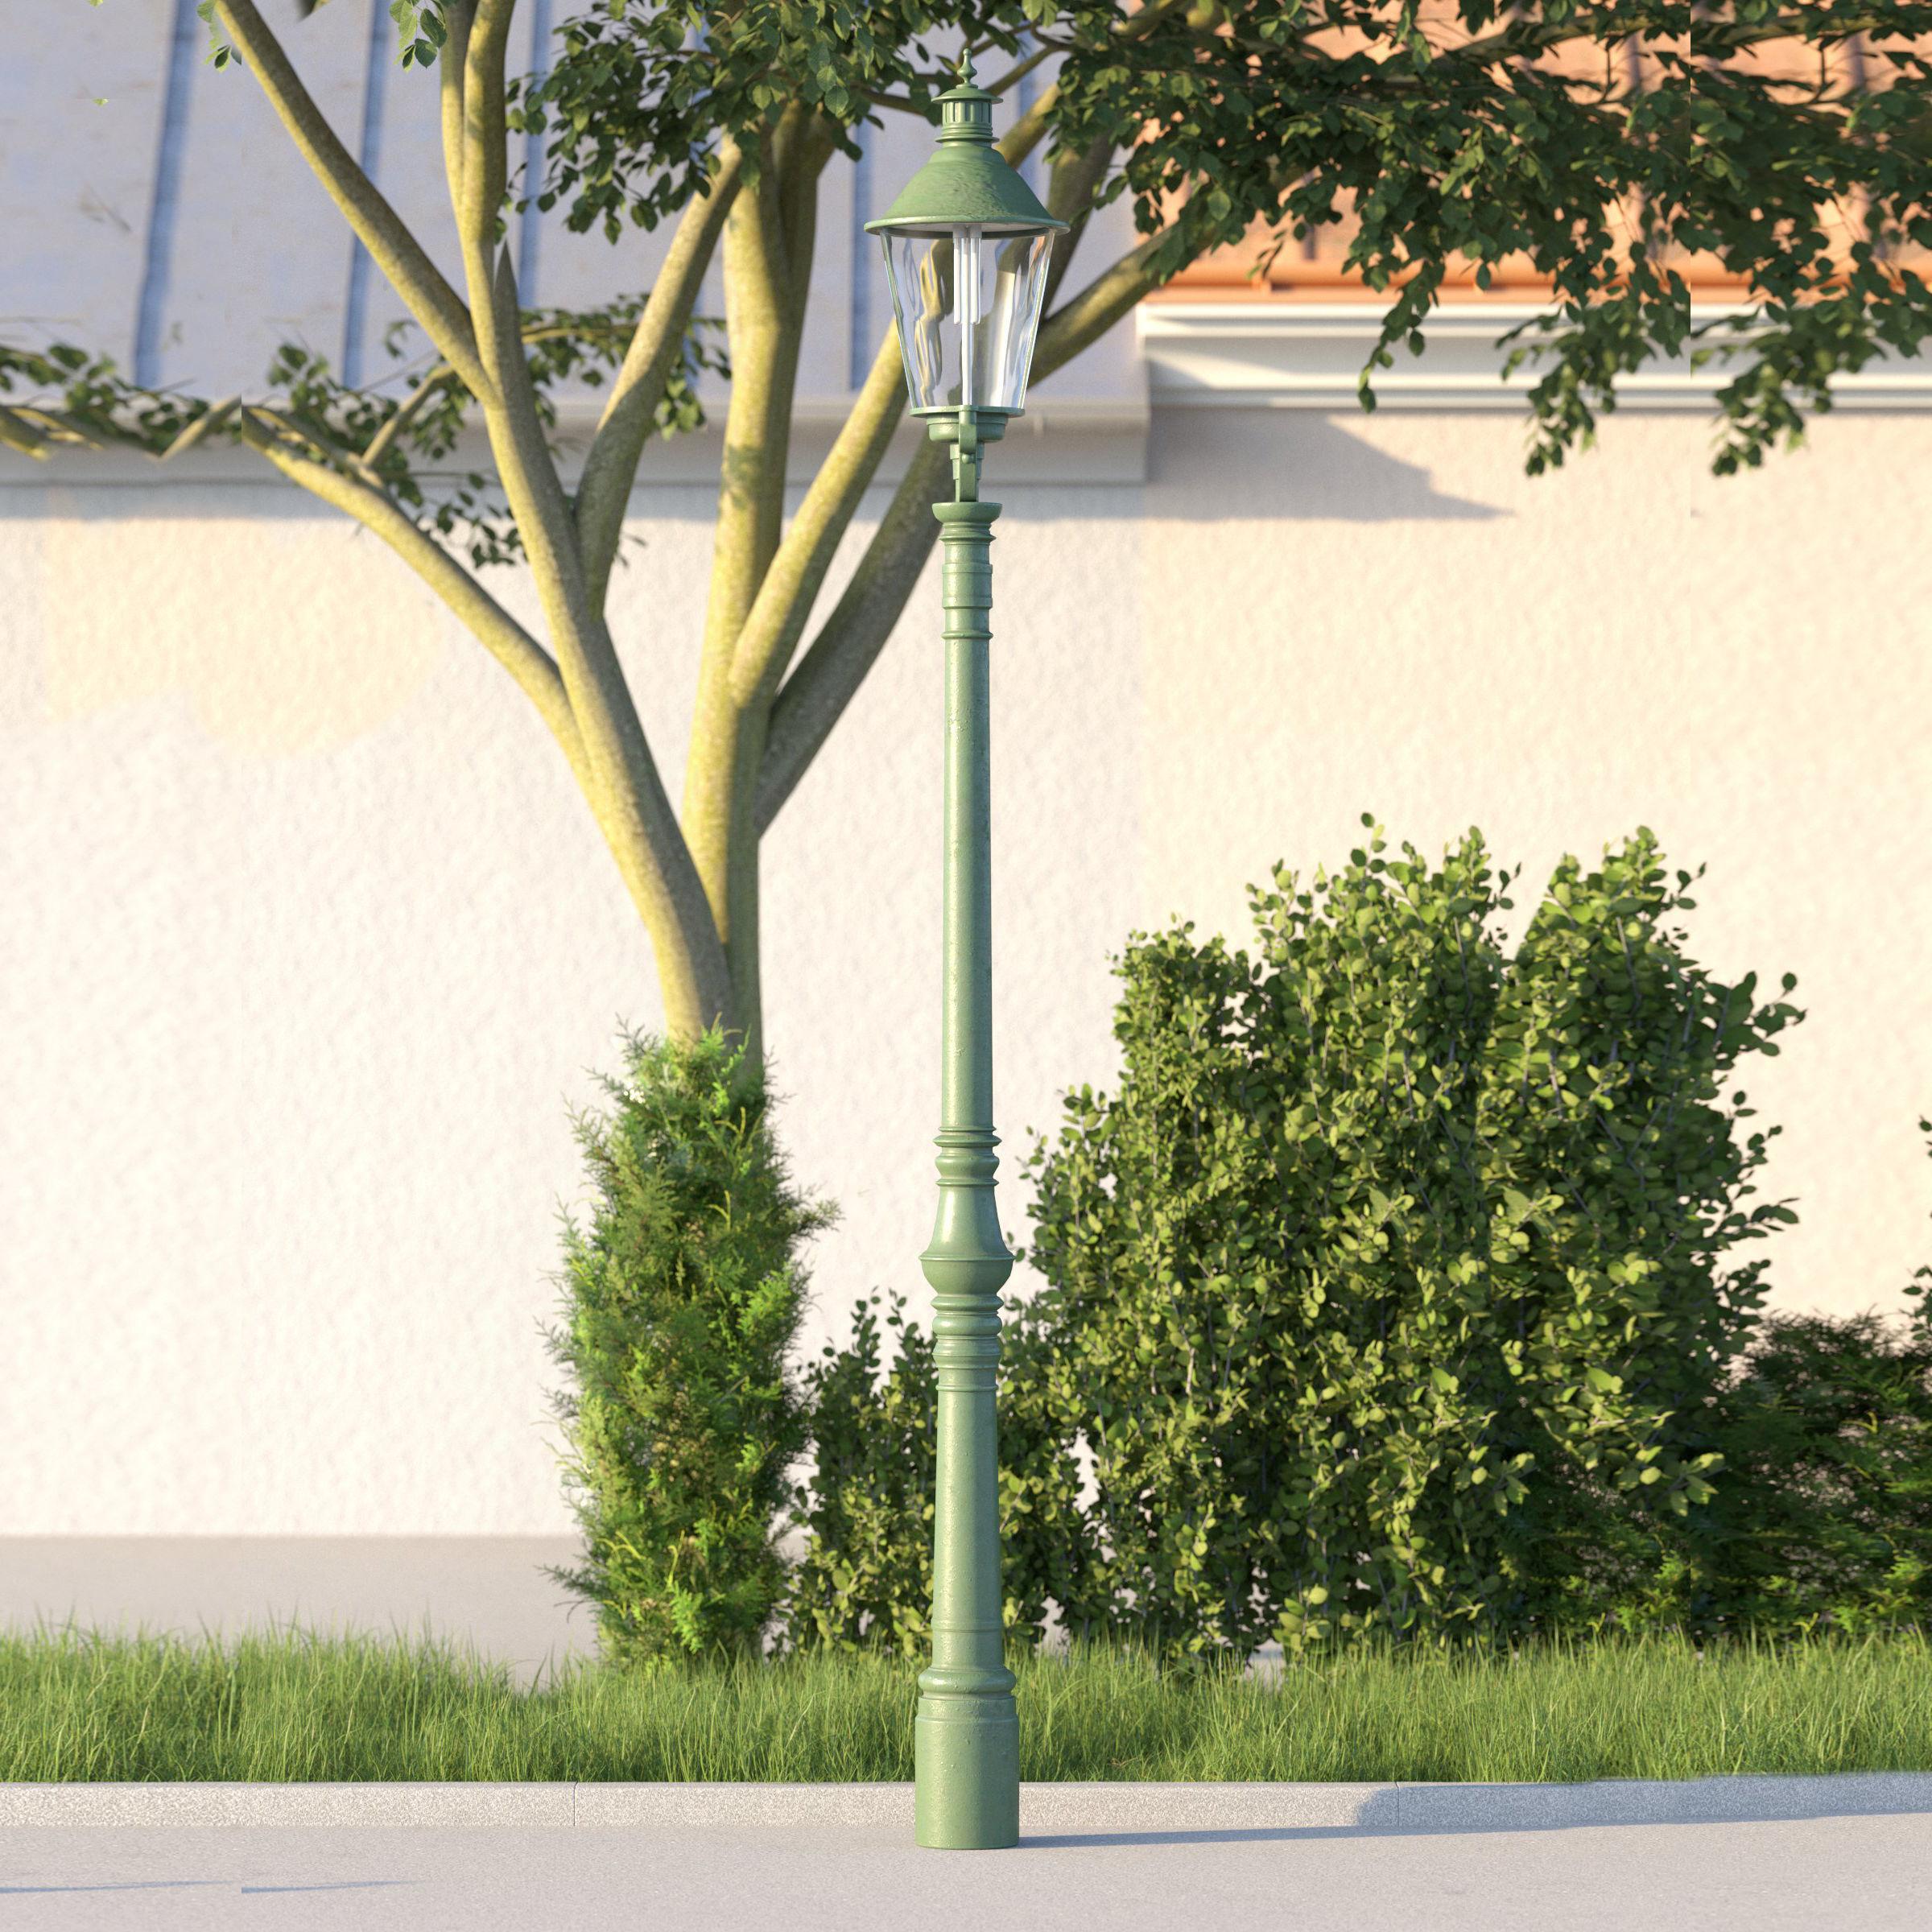 vienna public street lamp